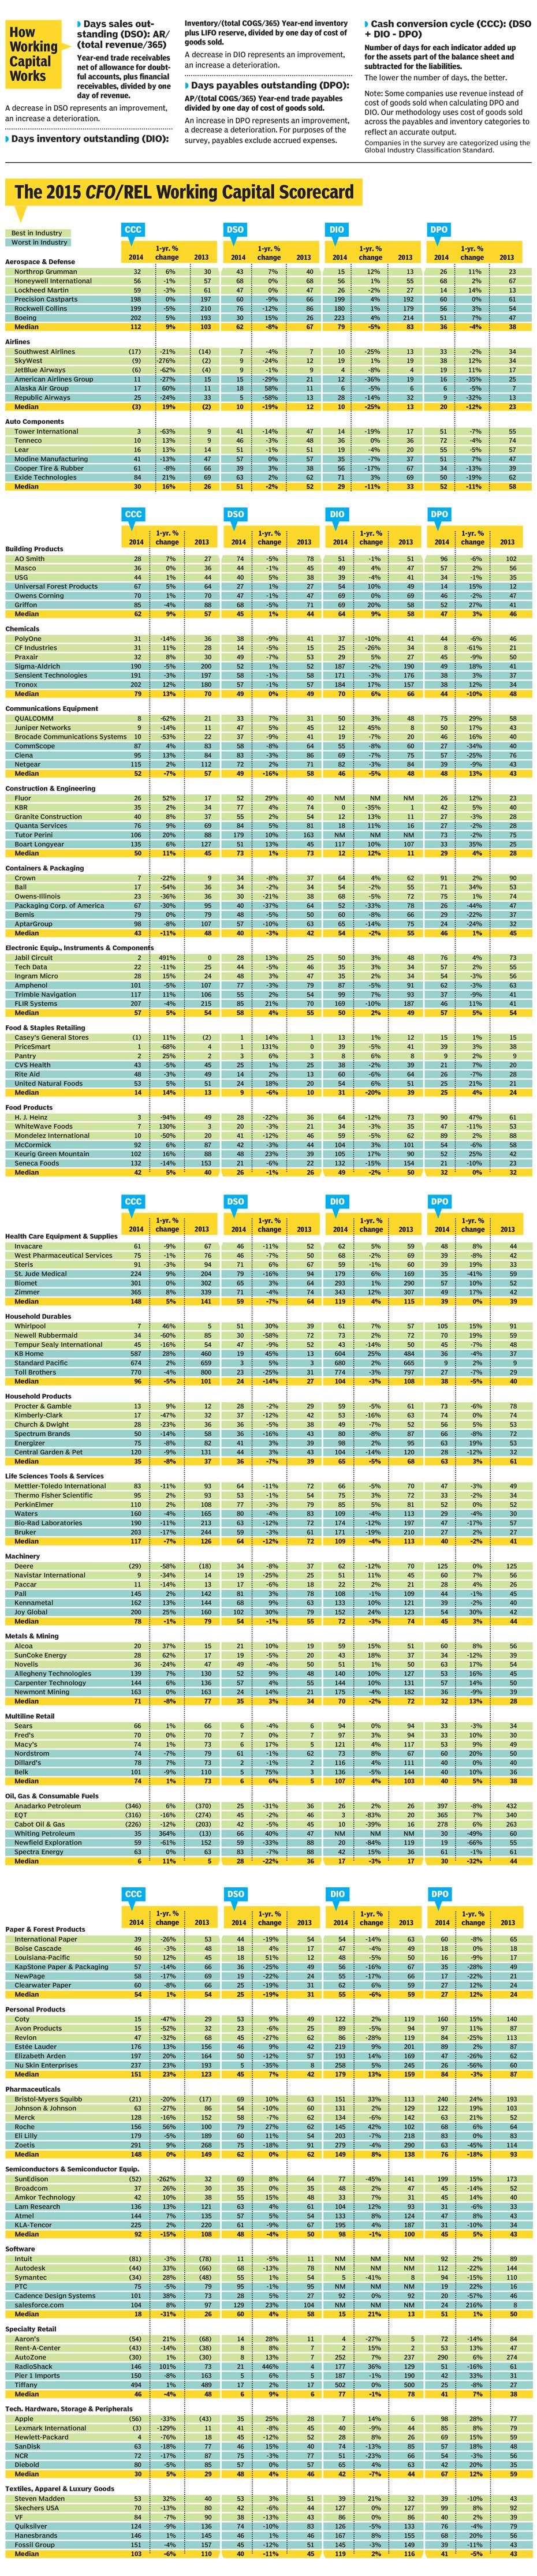 The 2015 CFO/REL Working Capital Scorecard